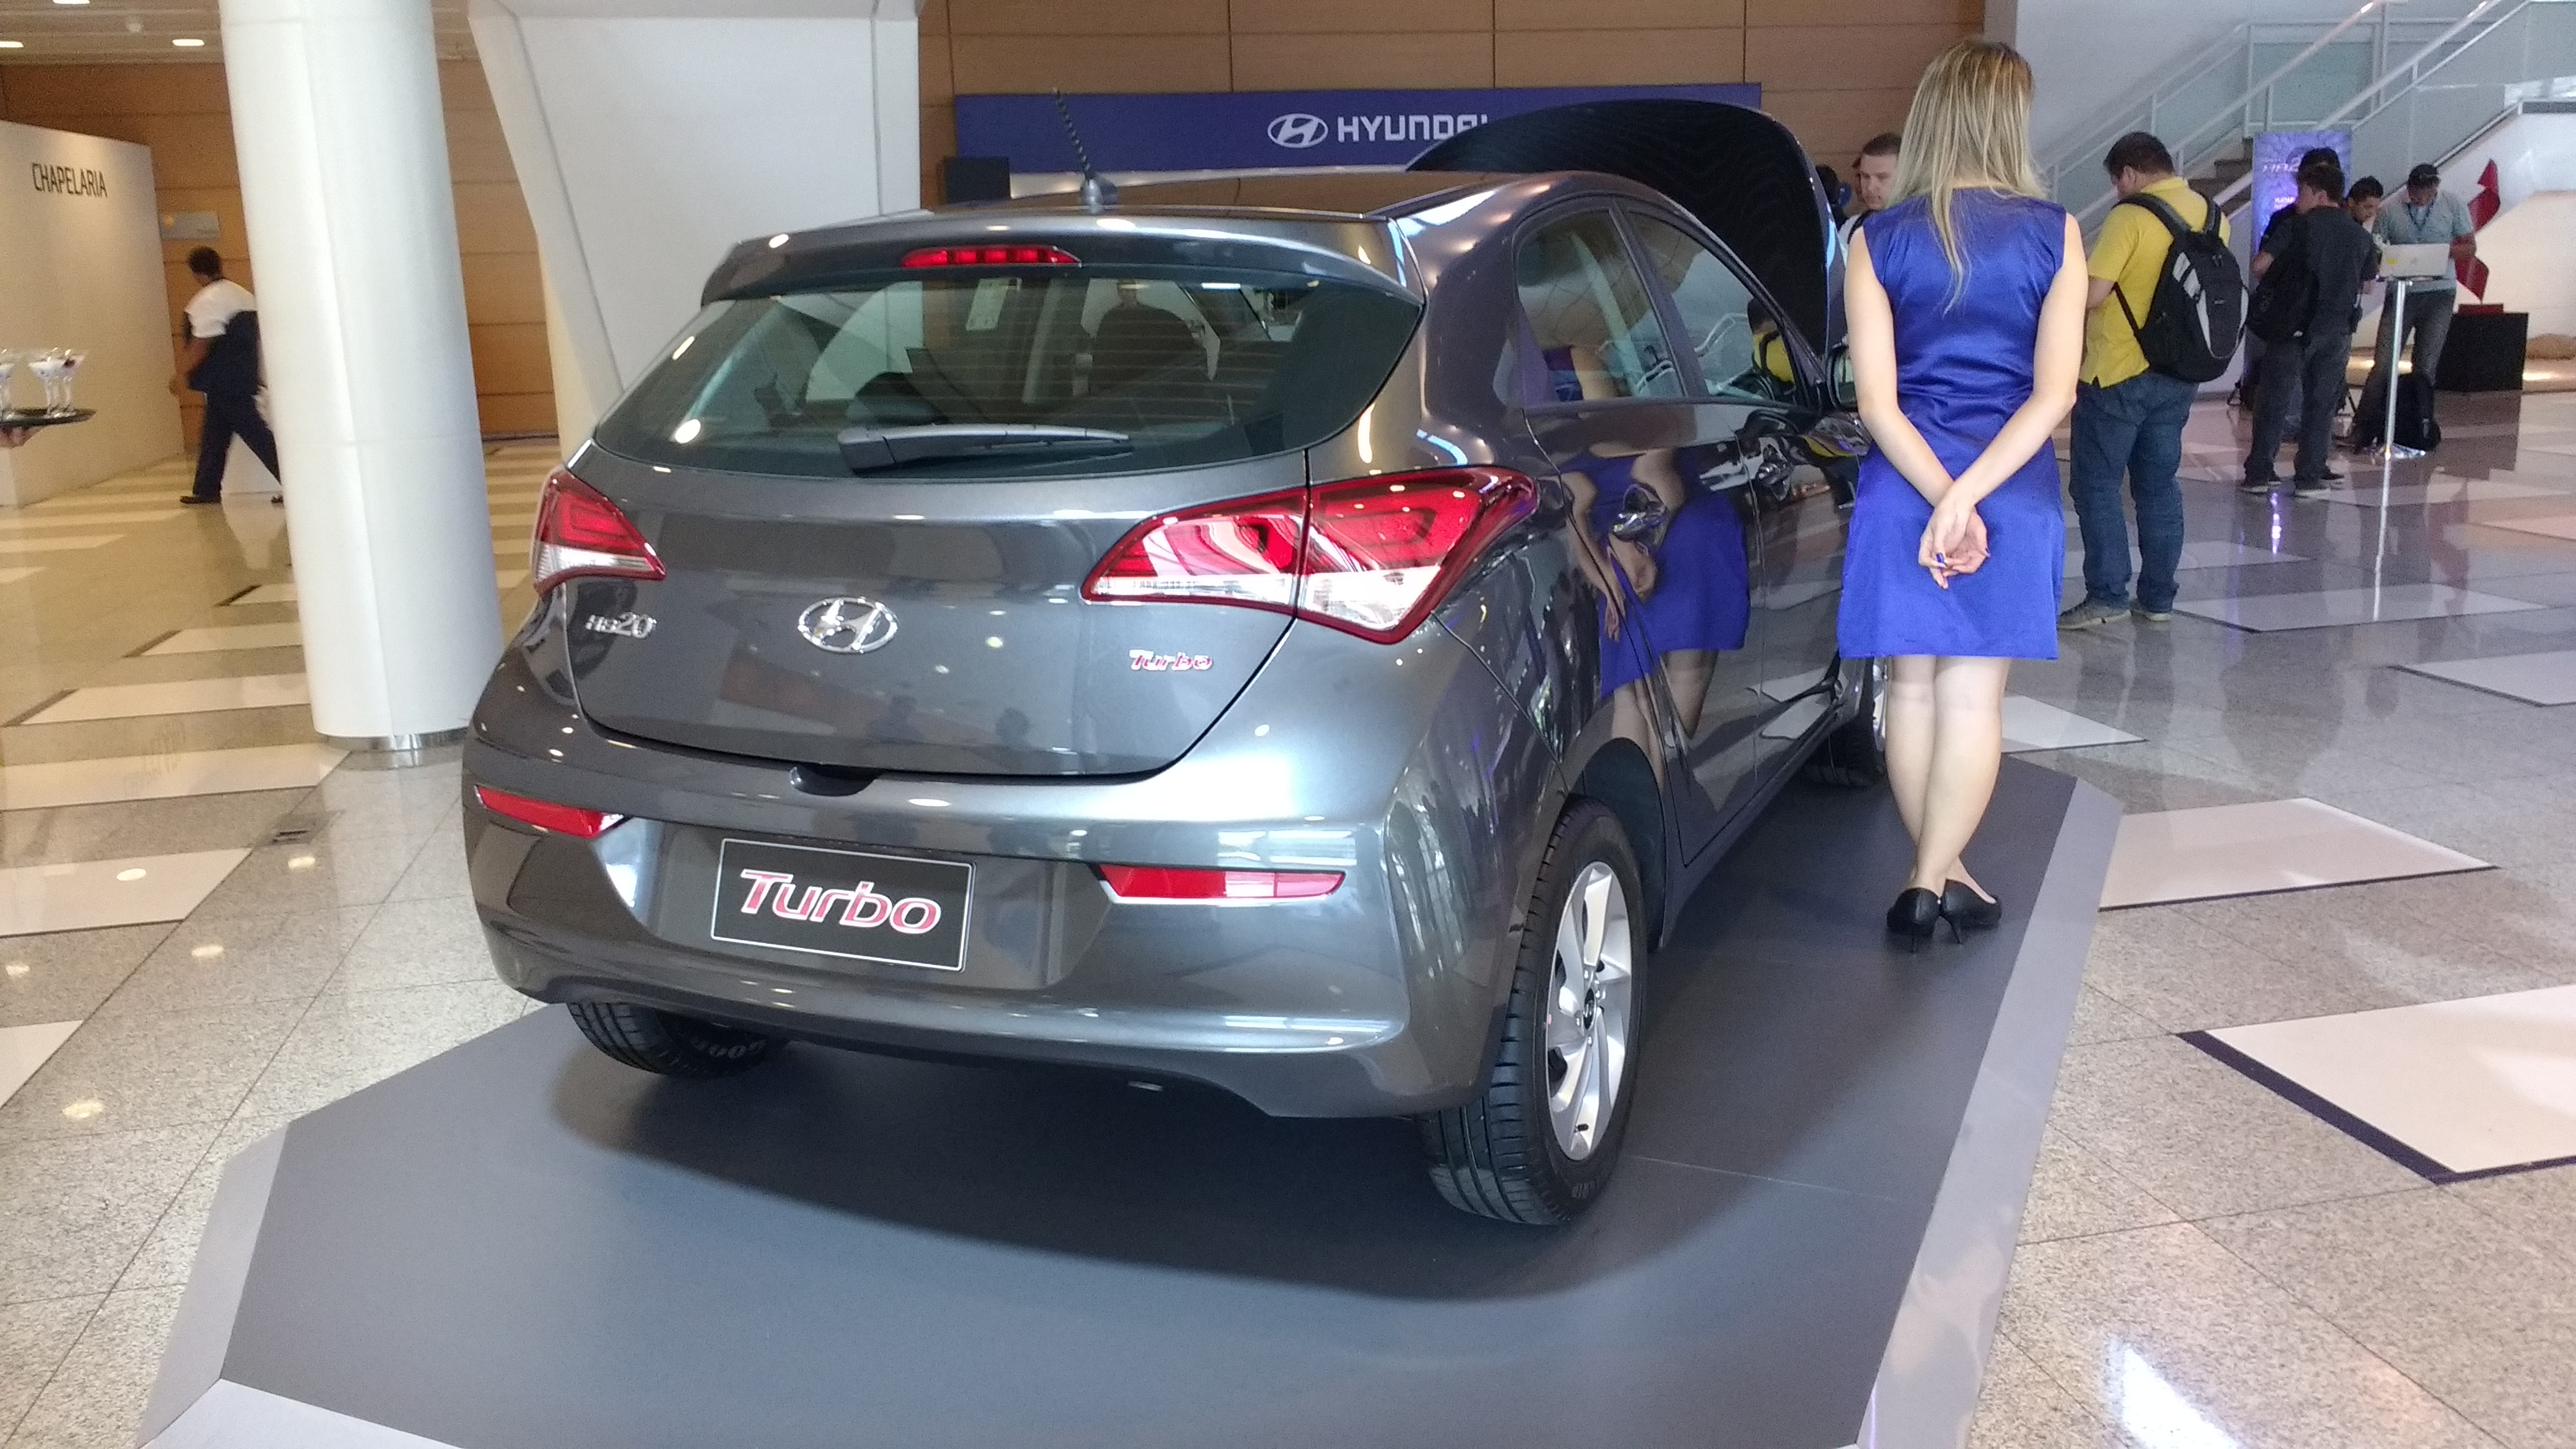 Hyundai HB20 Turbo